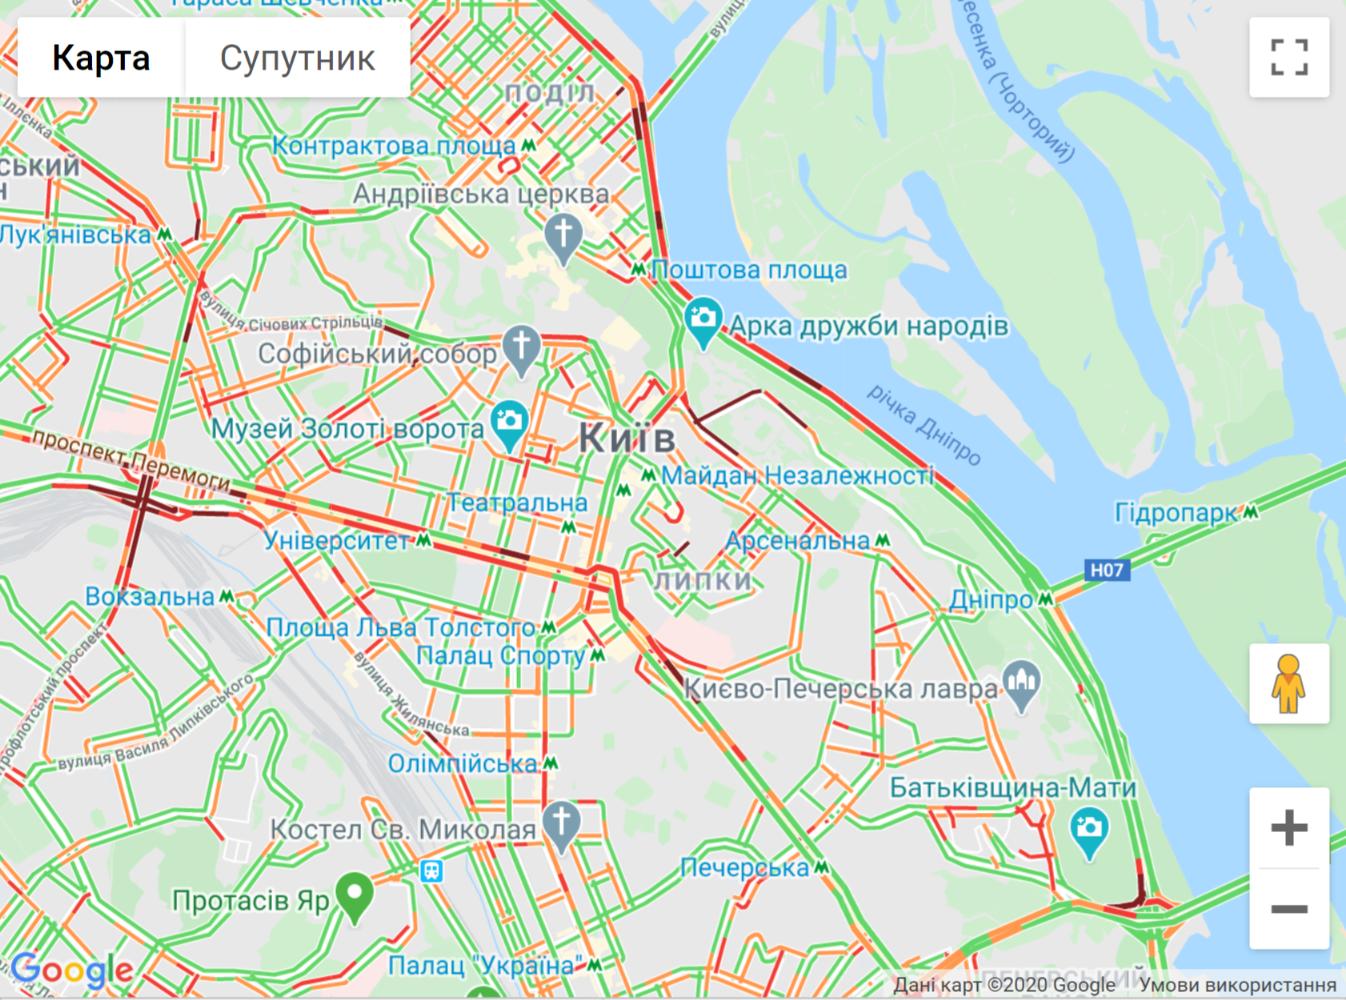 Пробки в центре Киева